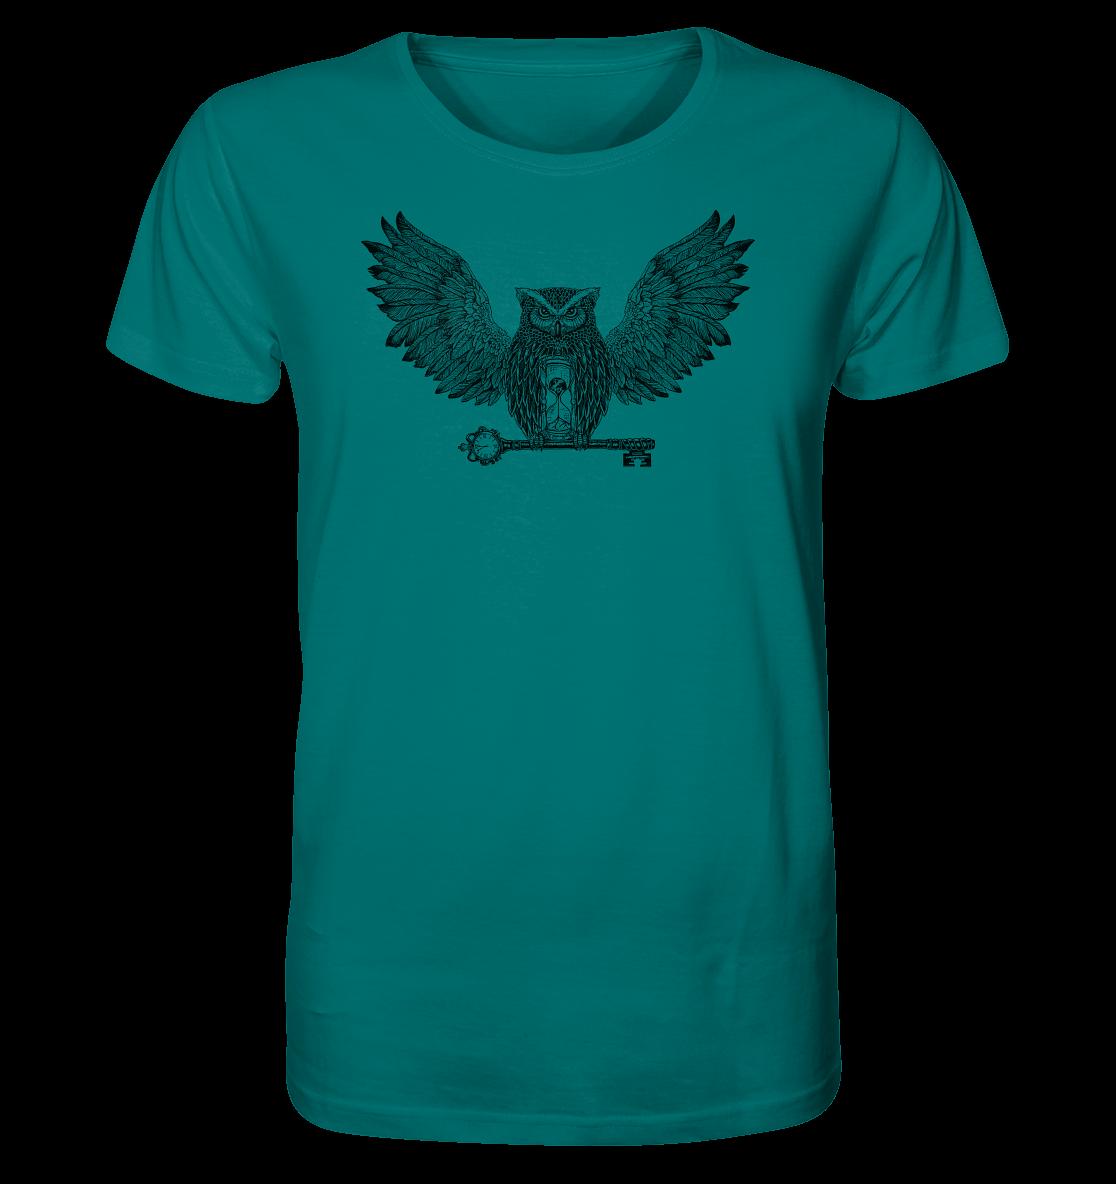 front-organic-shirt-007373-1116x-10.png